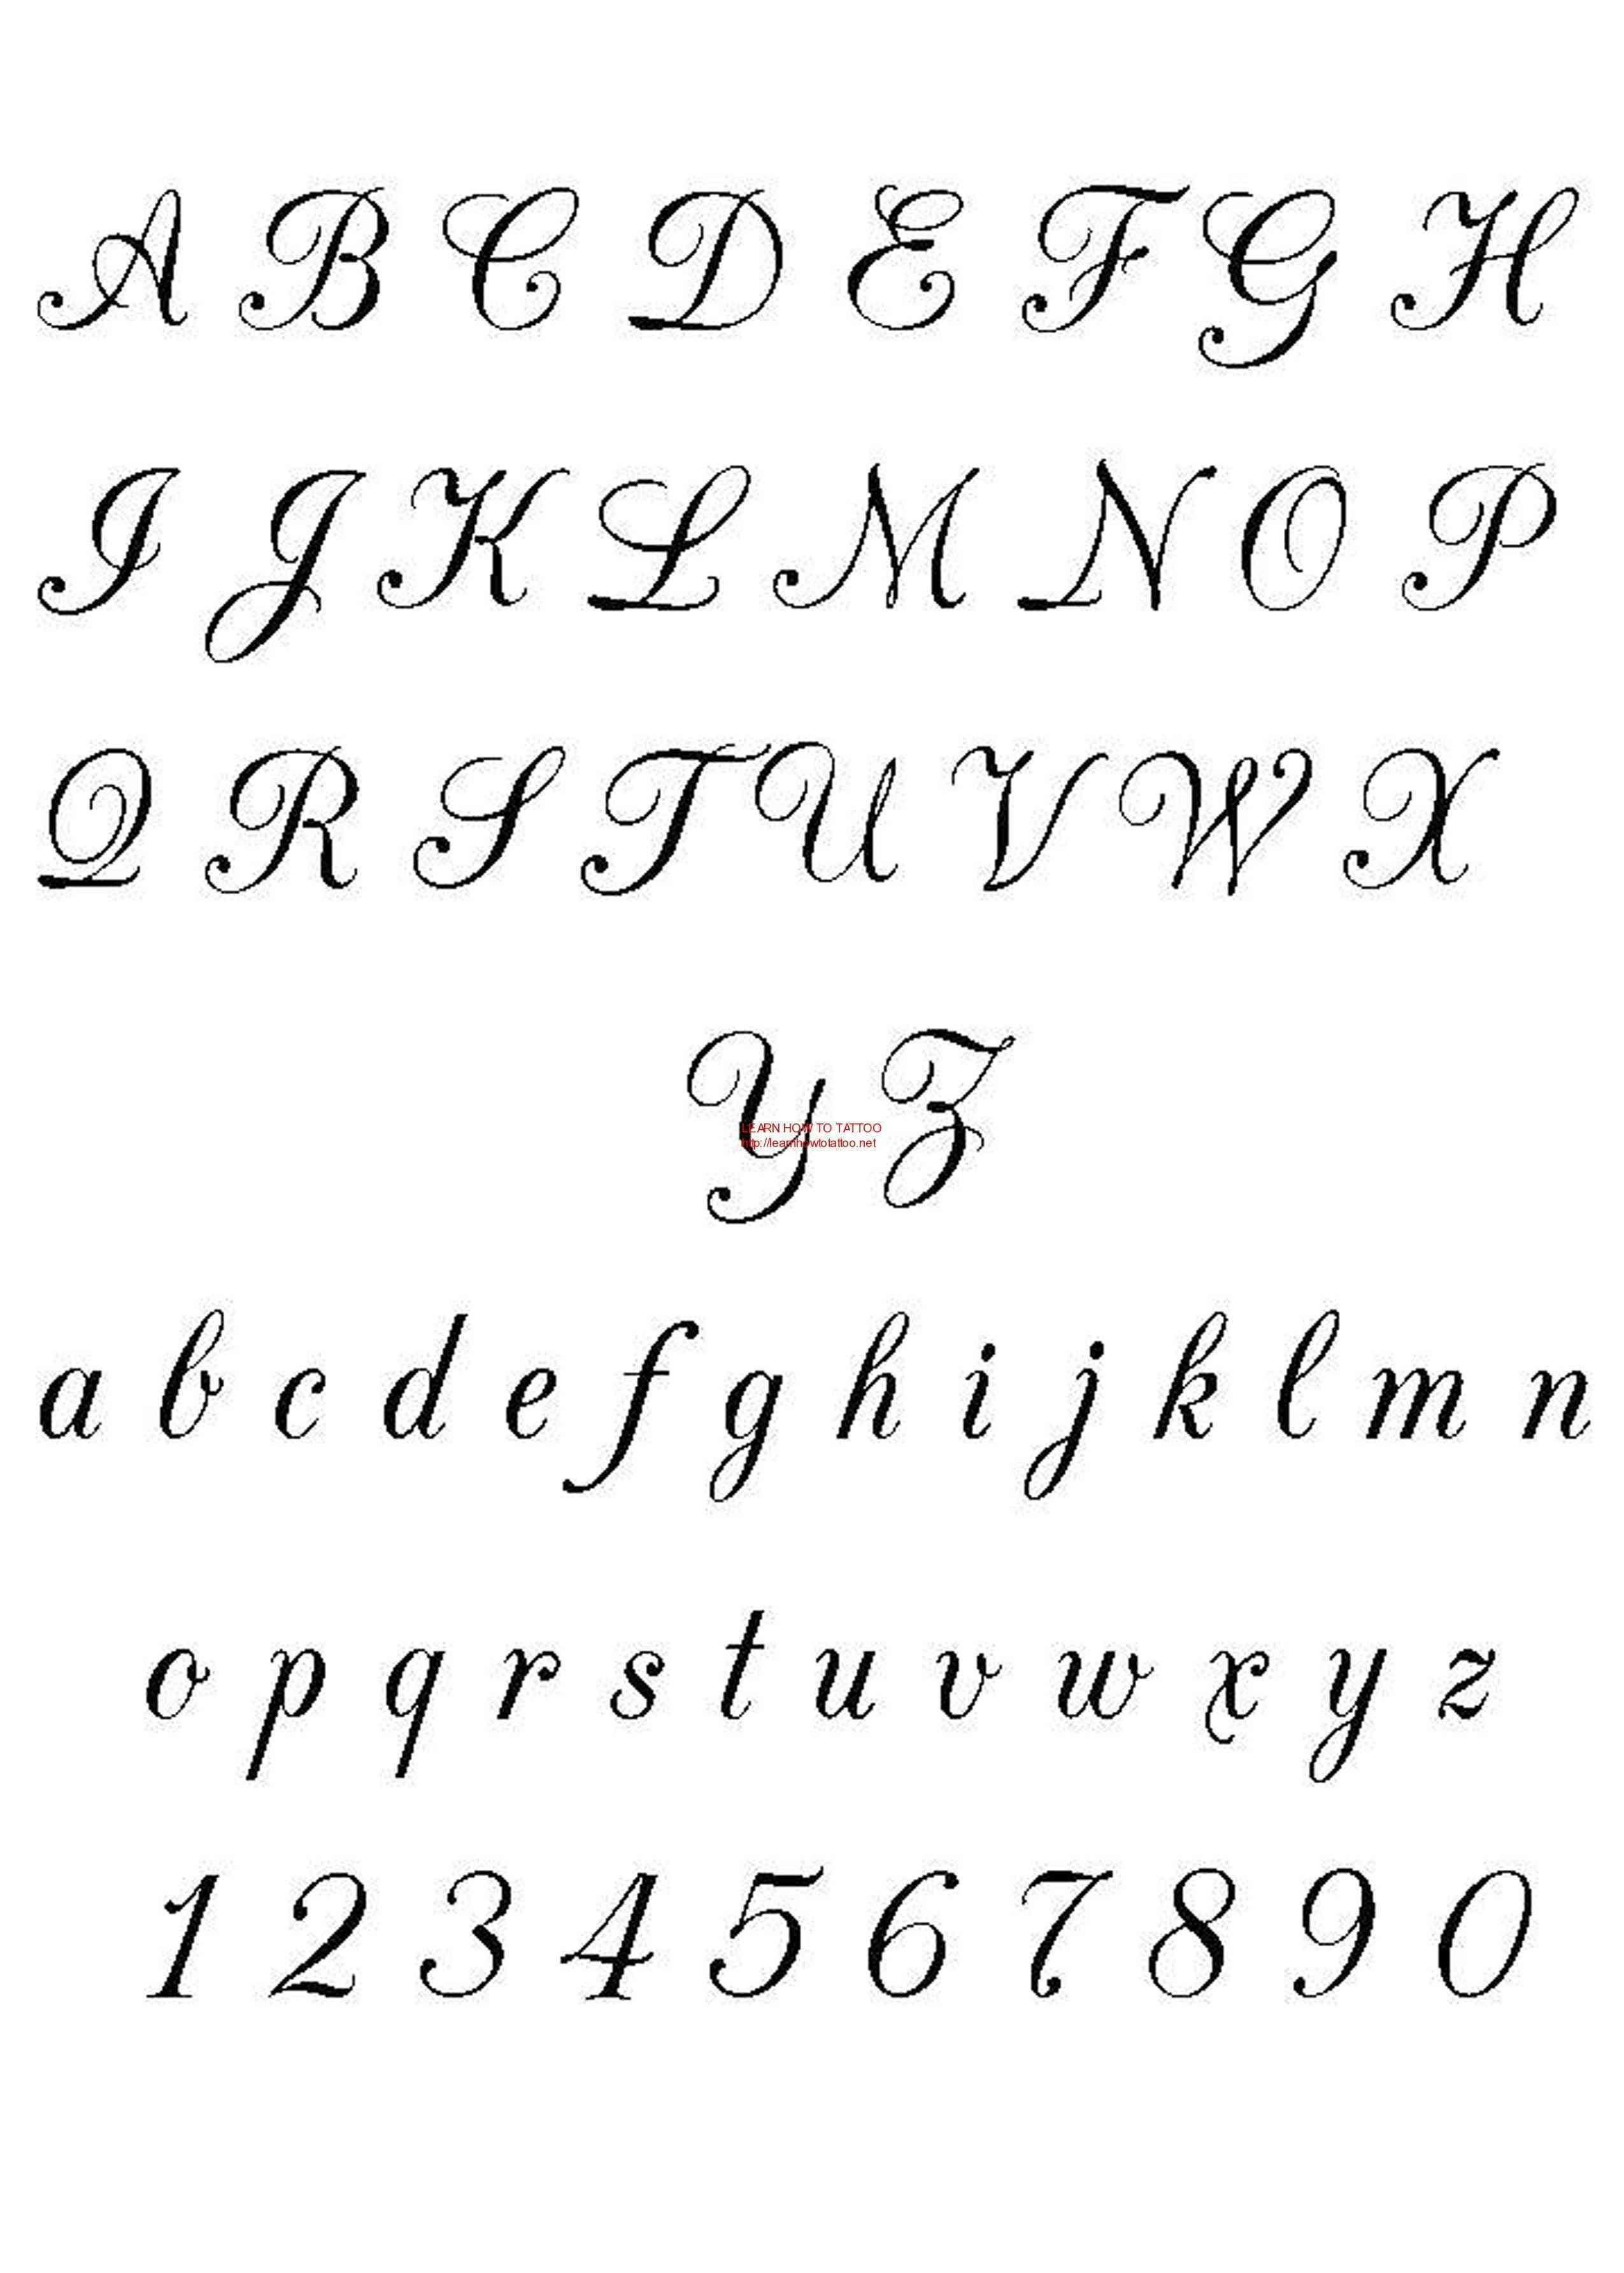 Old English Cursive Alphabet : english, cursive, alphabet, Elegant, Cursive, Letter, Styles, Alphabet, Paijo, Network, Lettering,, Lettering, Alphabet,, Tattoo, Fonts